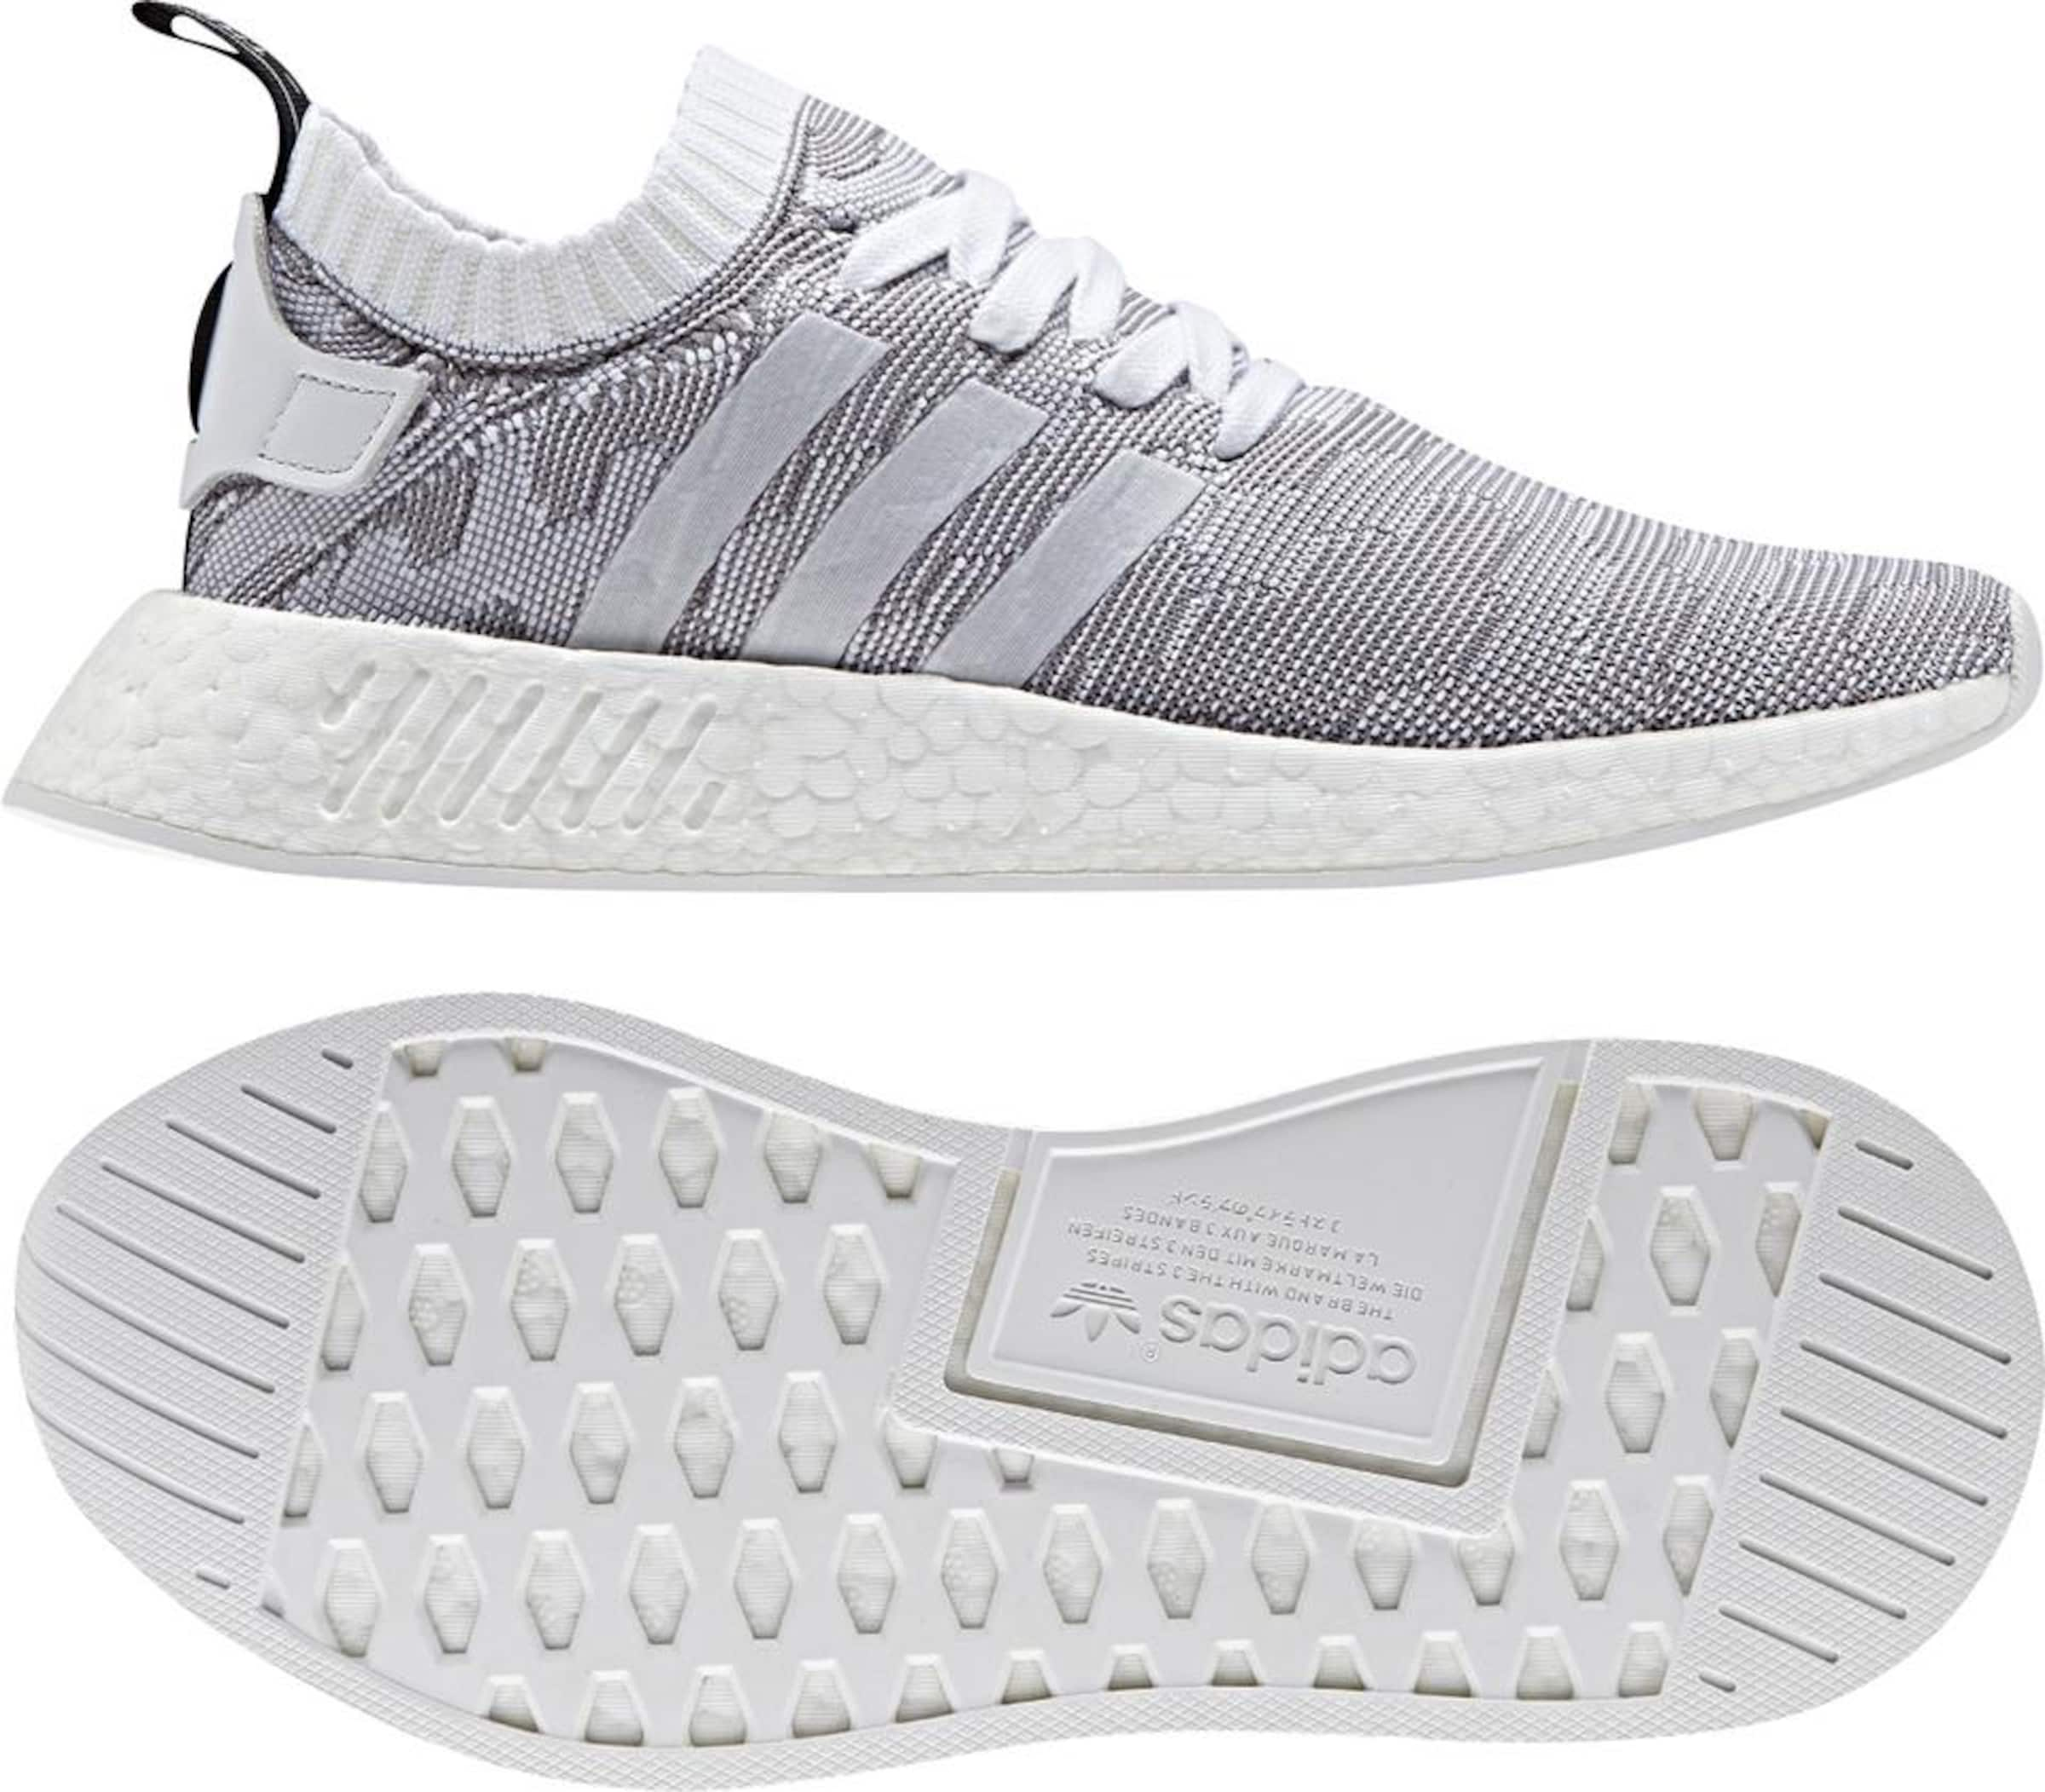 'nmd R2 In HellgrauWeiß Sneaker Primeknit Originals Adidas W' QrCtshdBxo